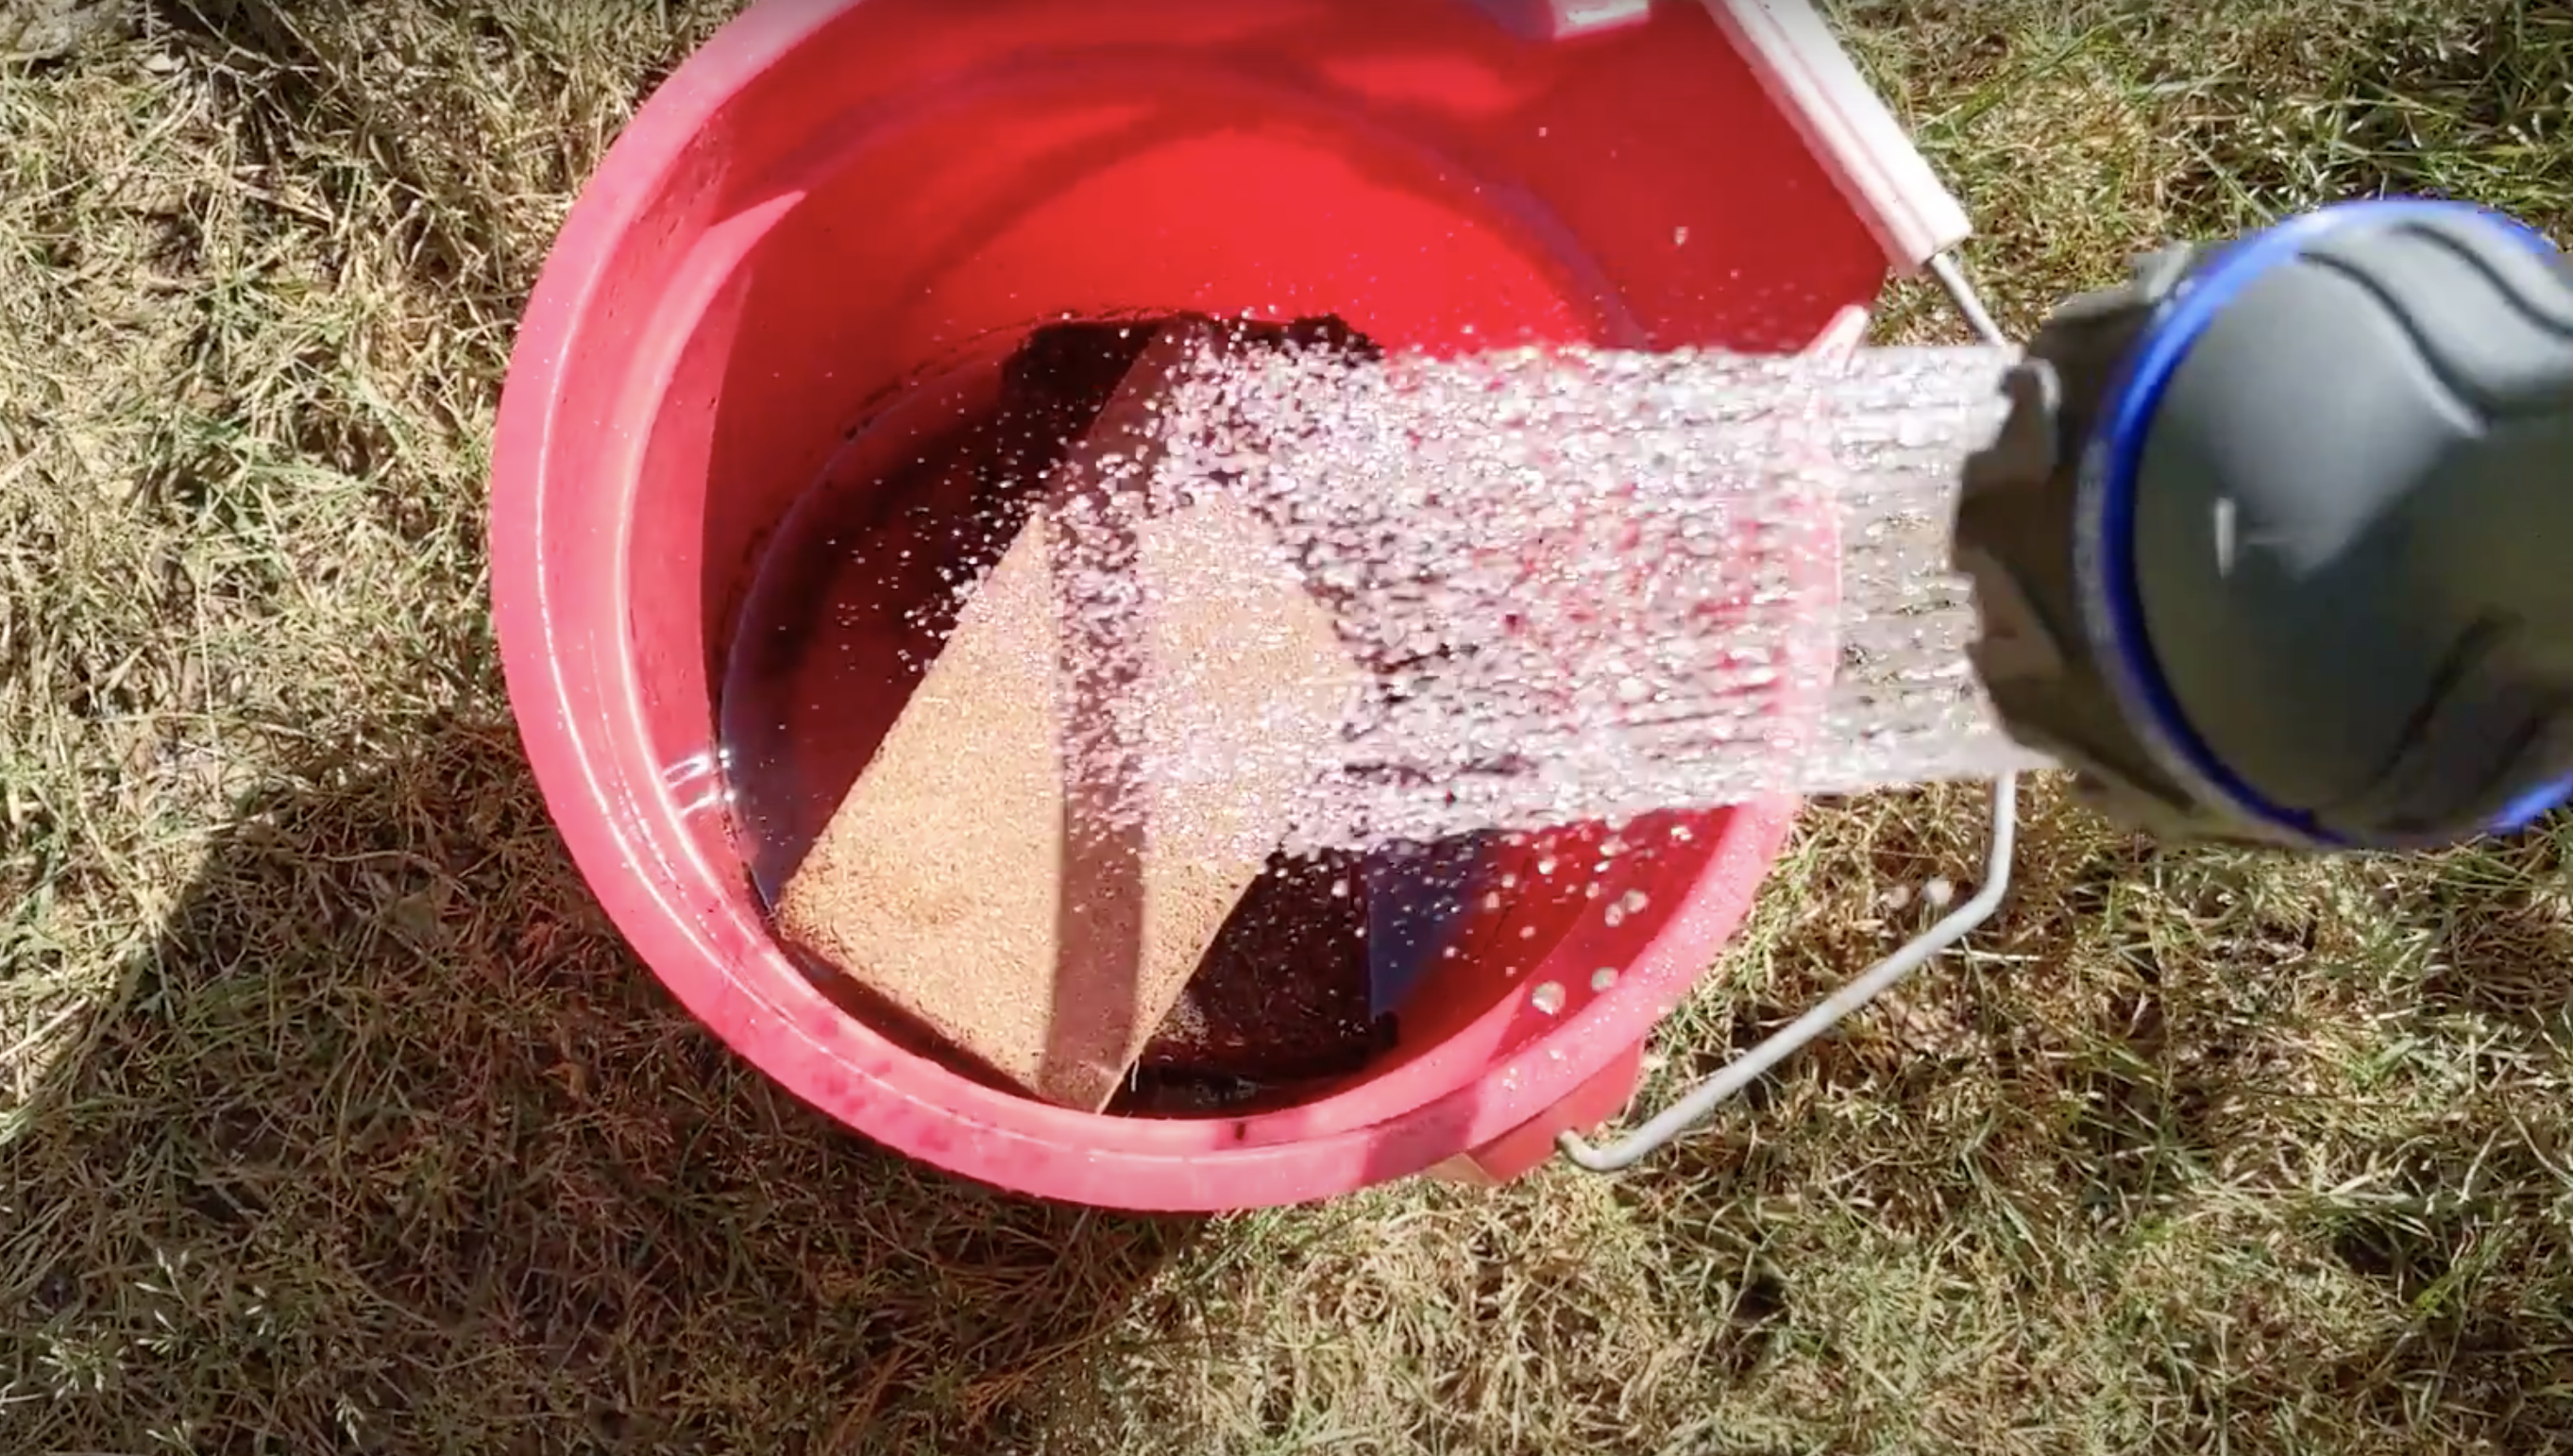 hydrating coconut coir bricks in a bucket